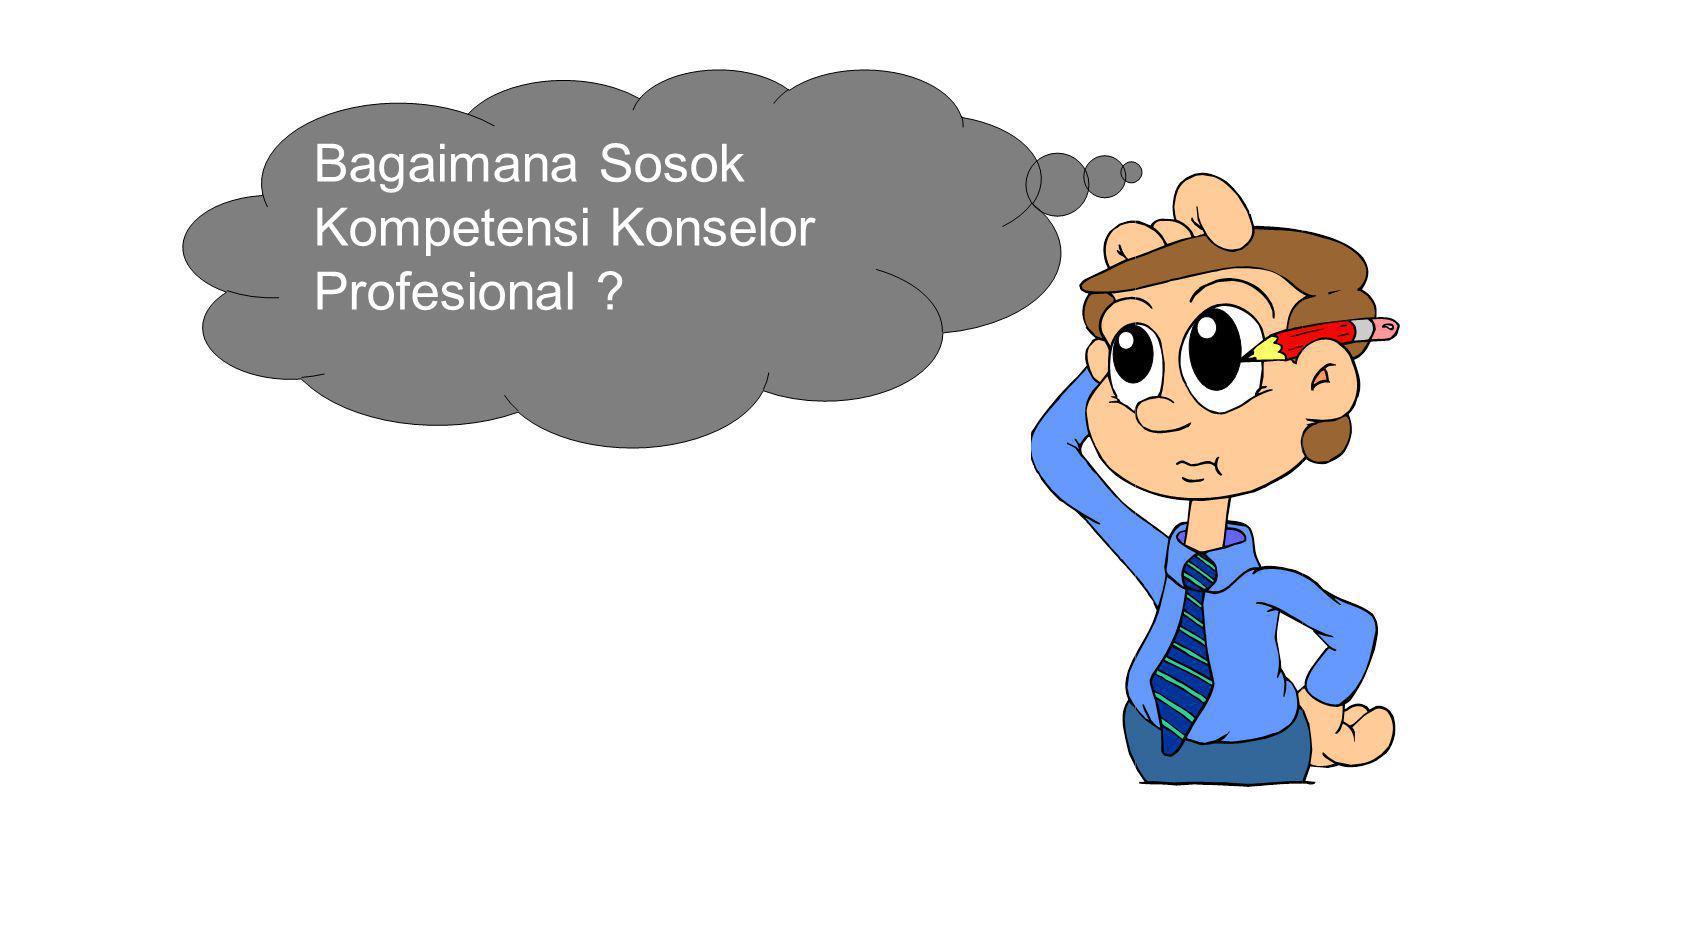 Bagaimana Sosok Kompetensi Konselor Profesional